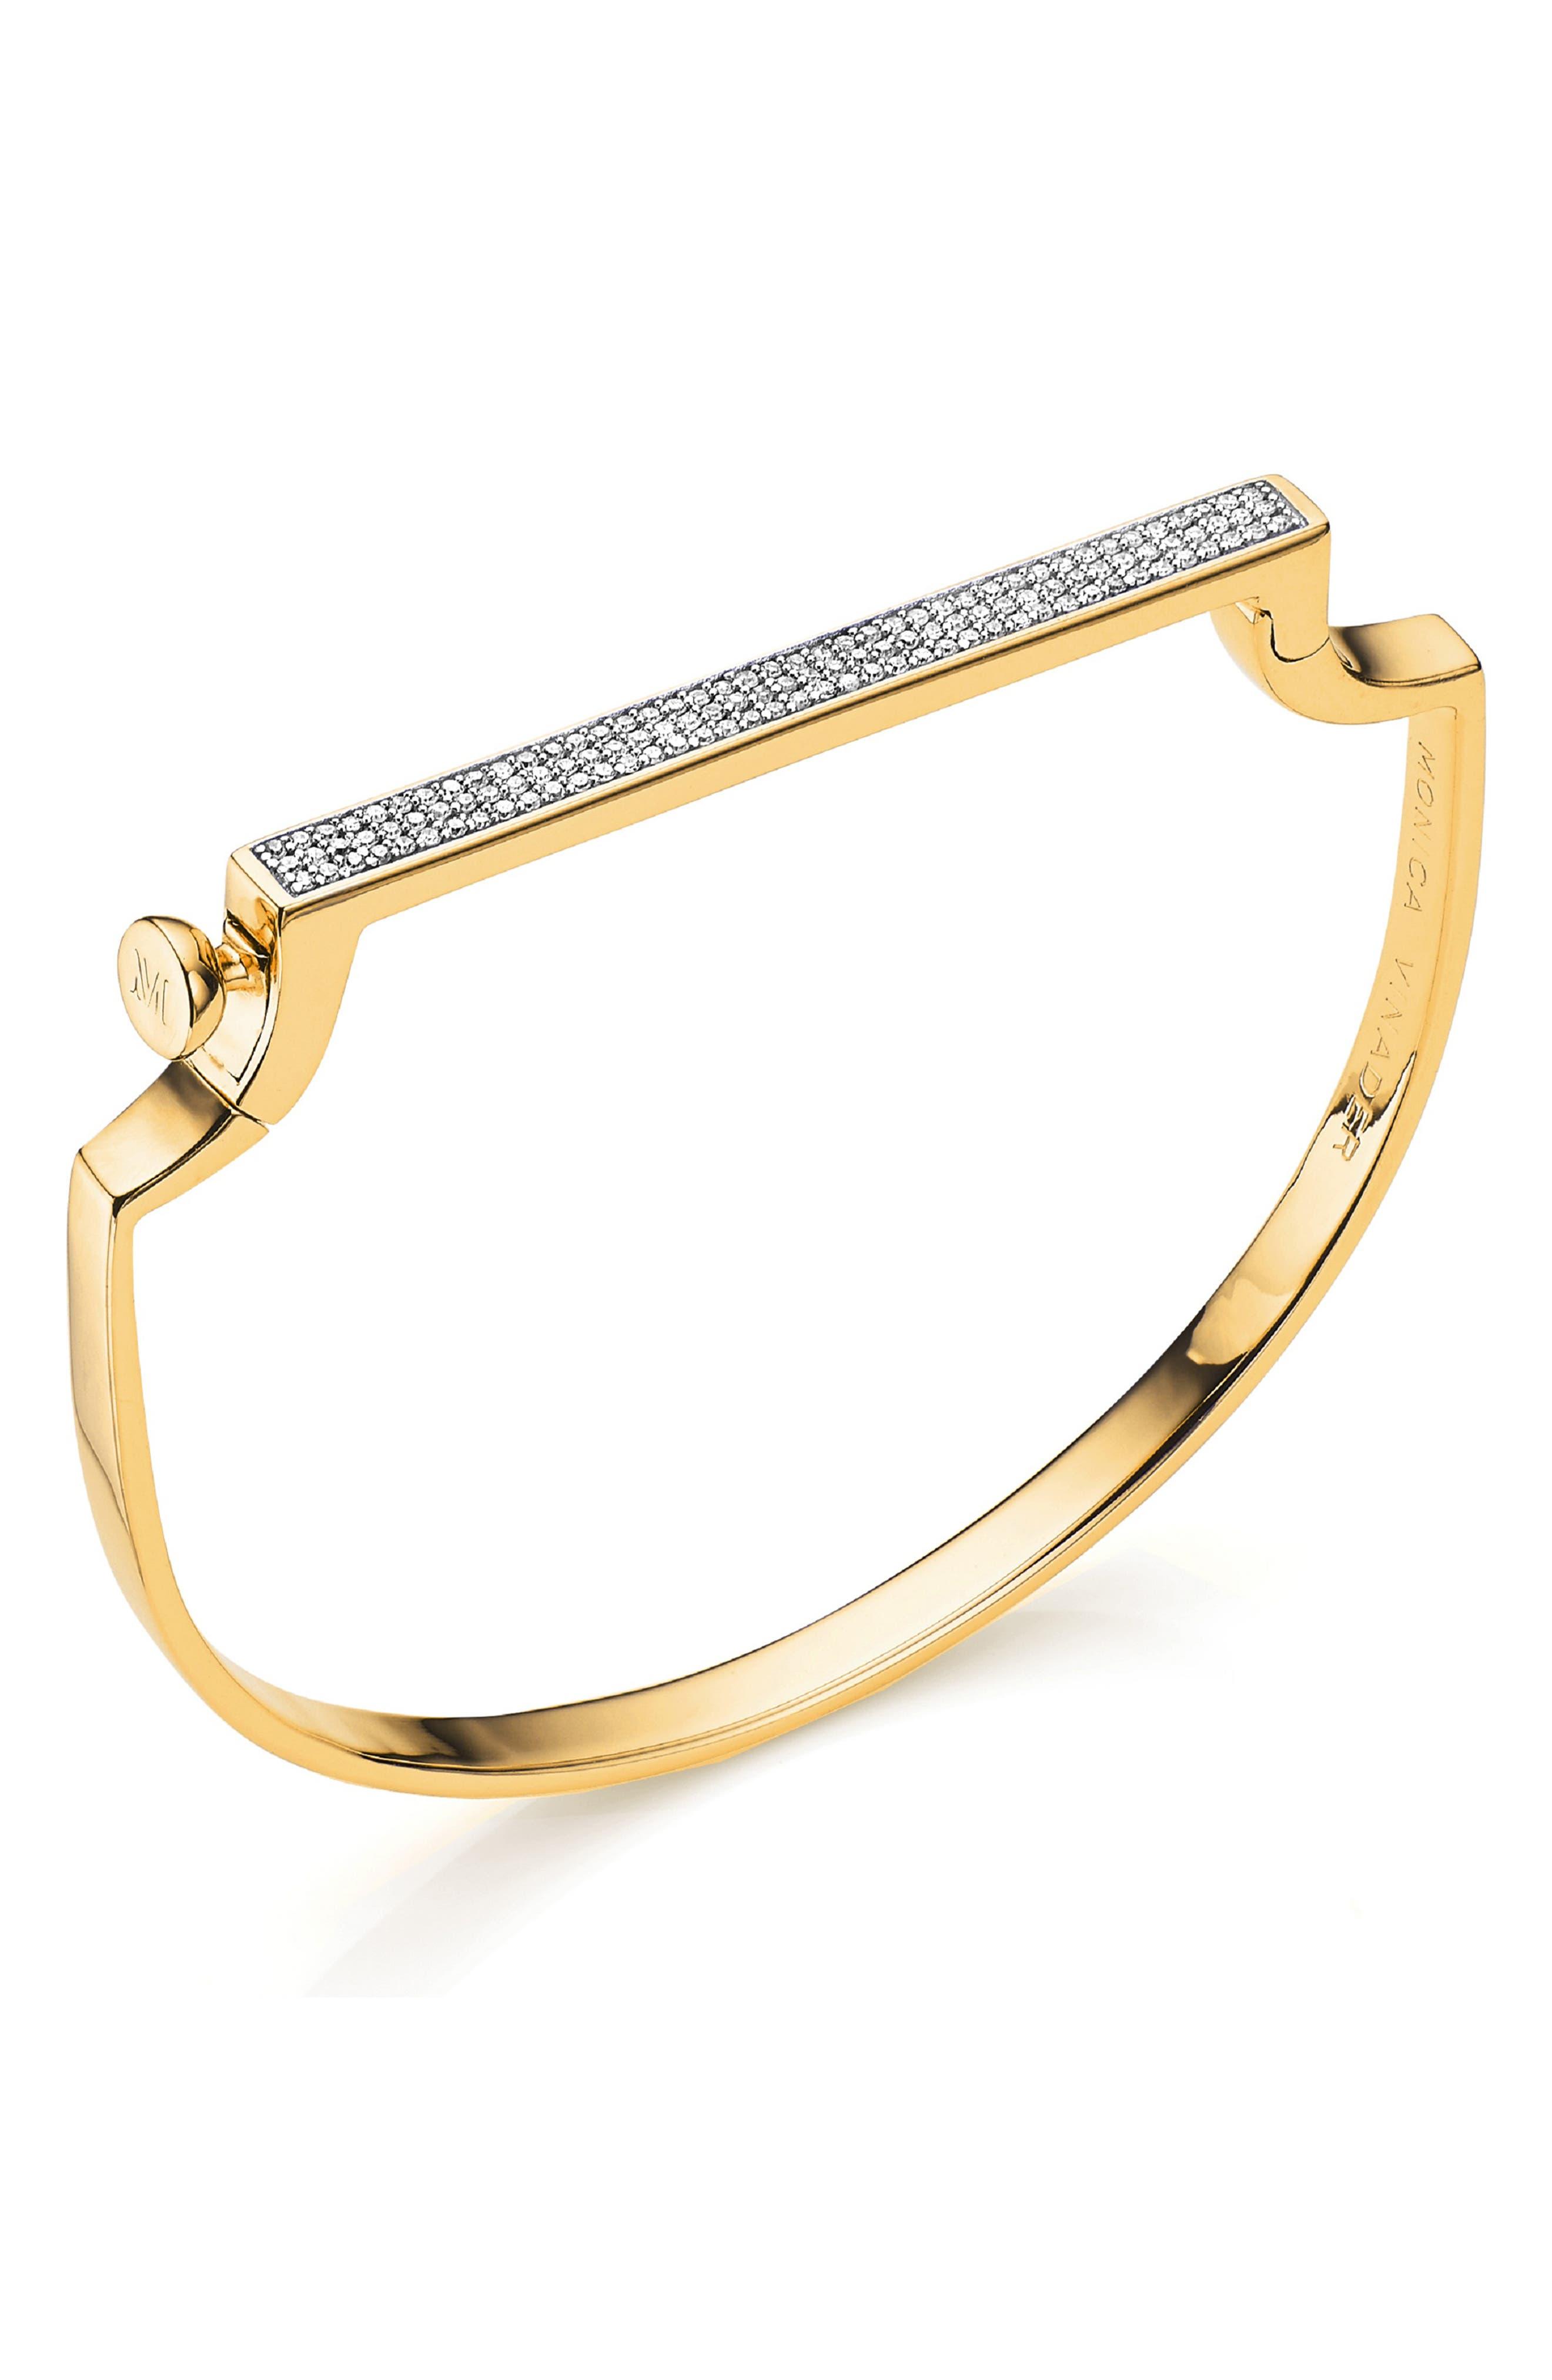 Signature Thin Diamond Bangle,                             Main thumbnail 1, color,                             YELLOW GOLD/ DIAMOND